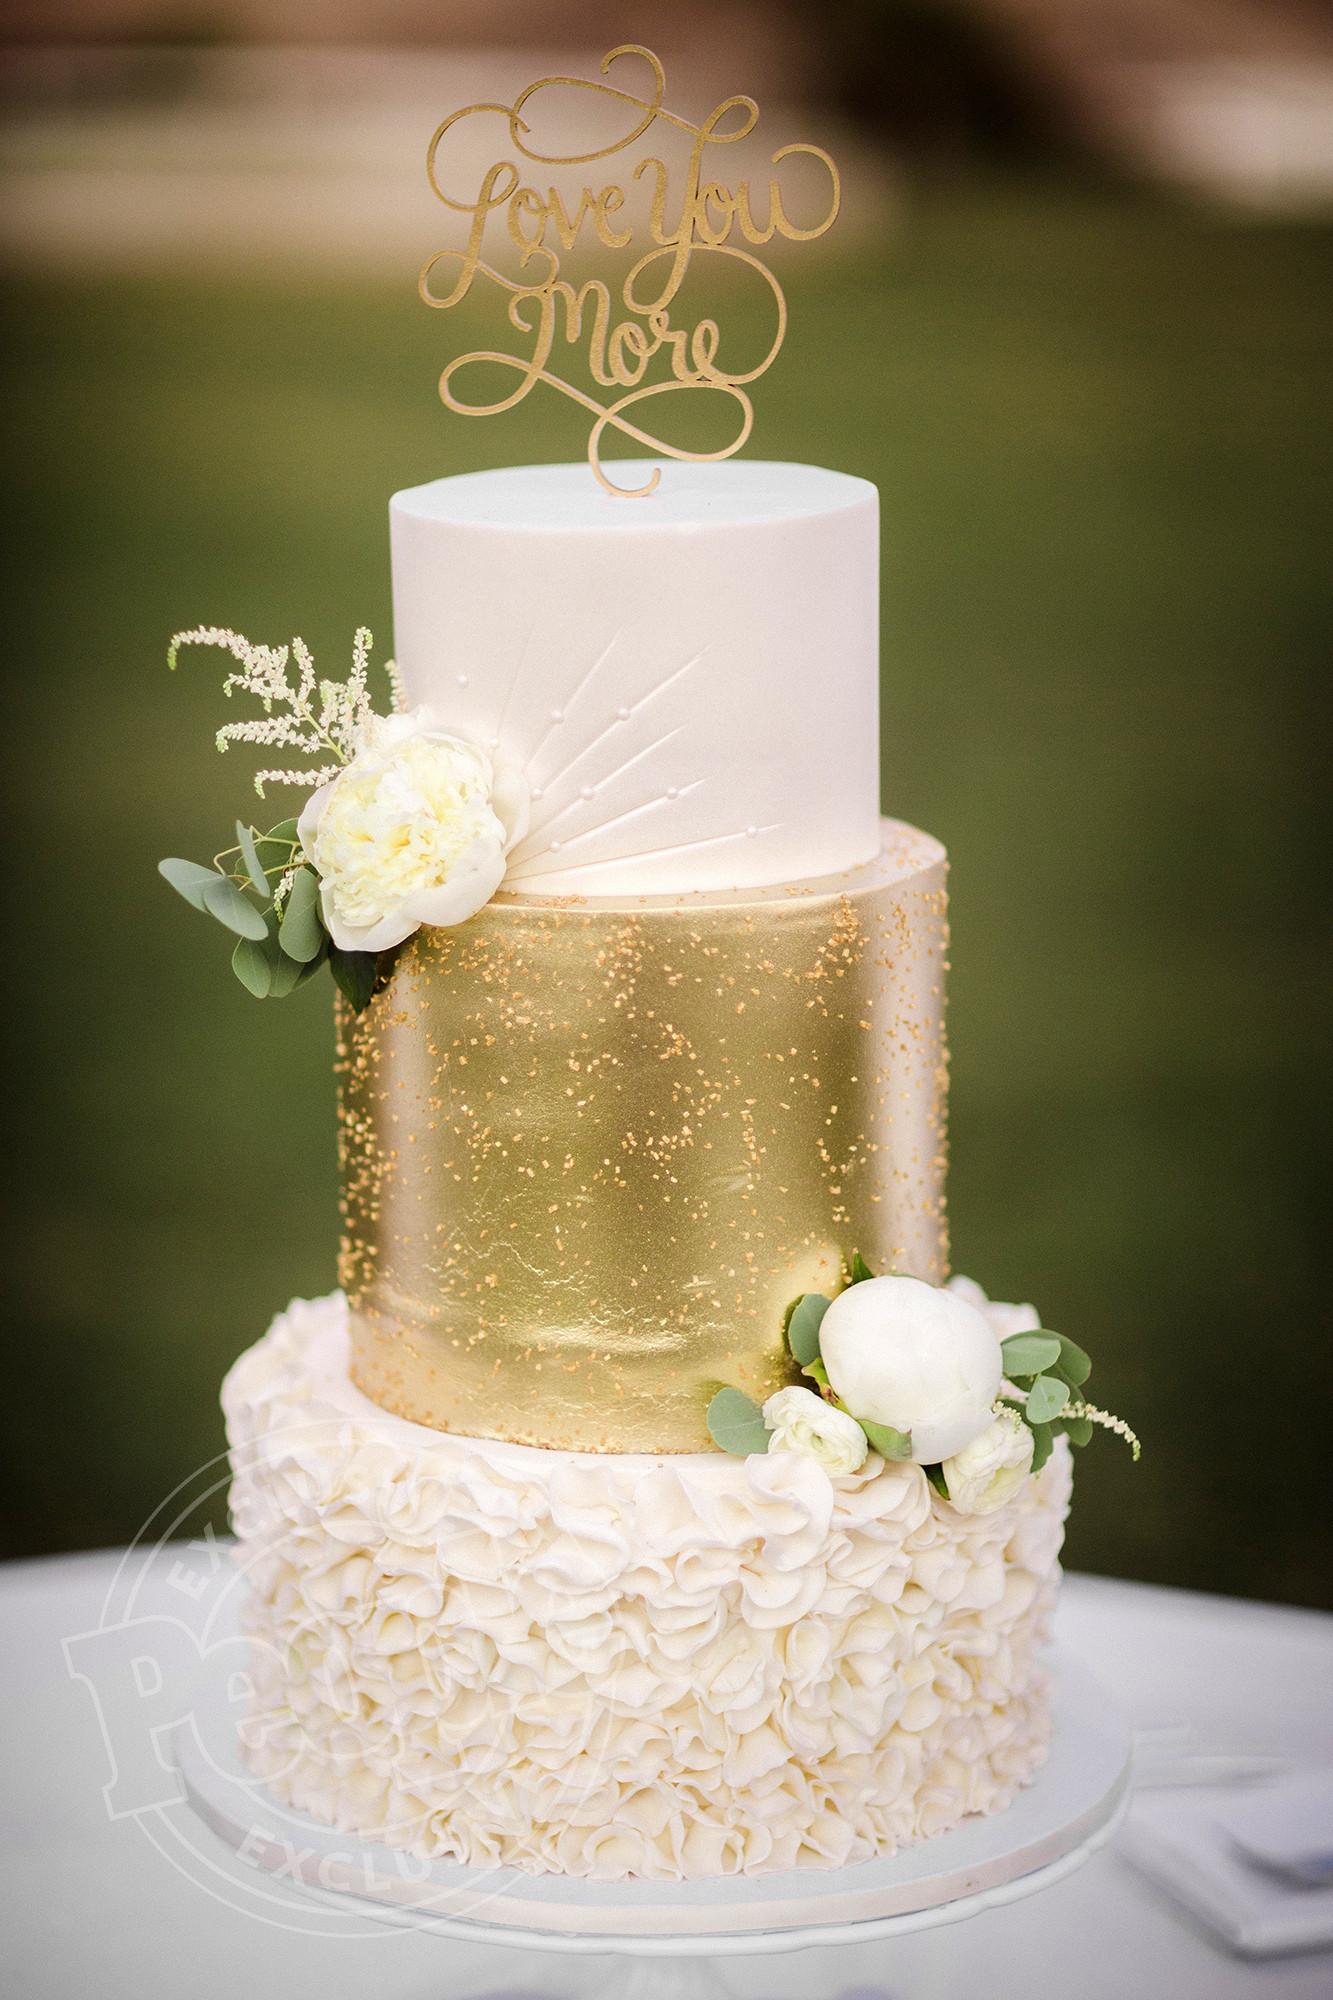 Three Tear Wedding Cakes  Corbin Bleu Wedding Cake See the Three Tiered Beauty